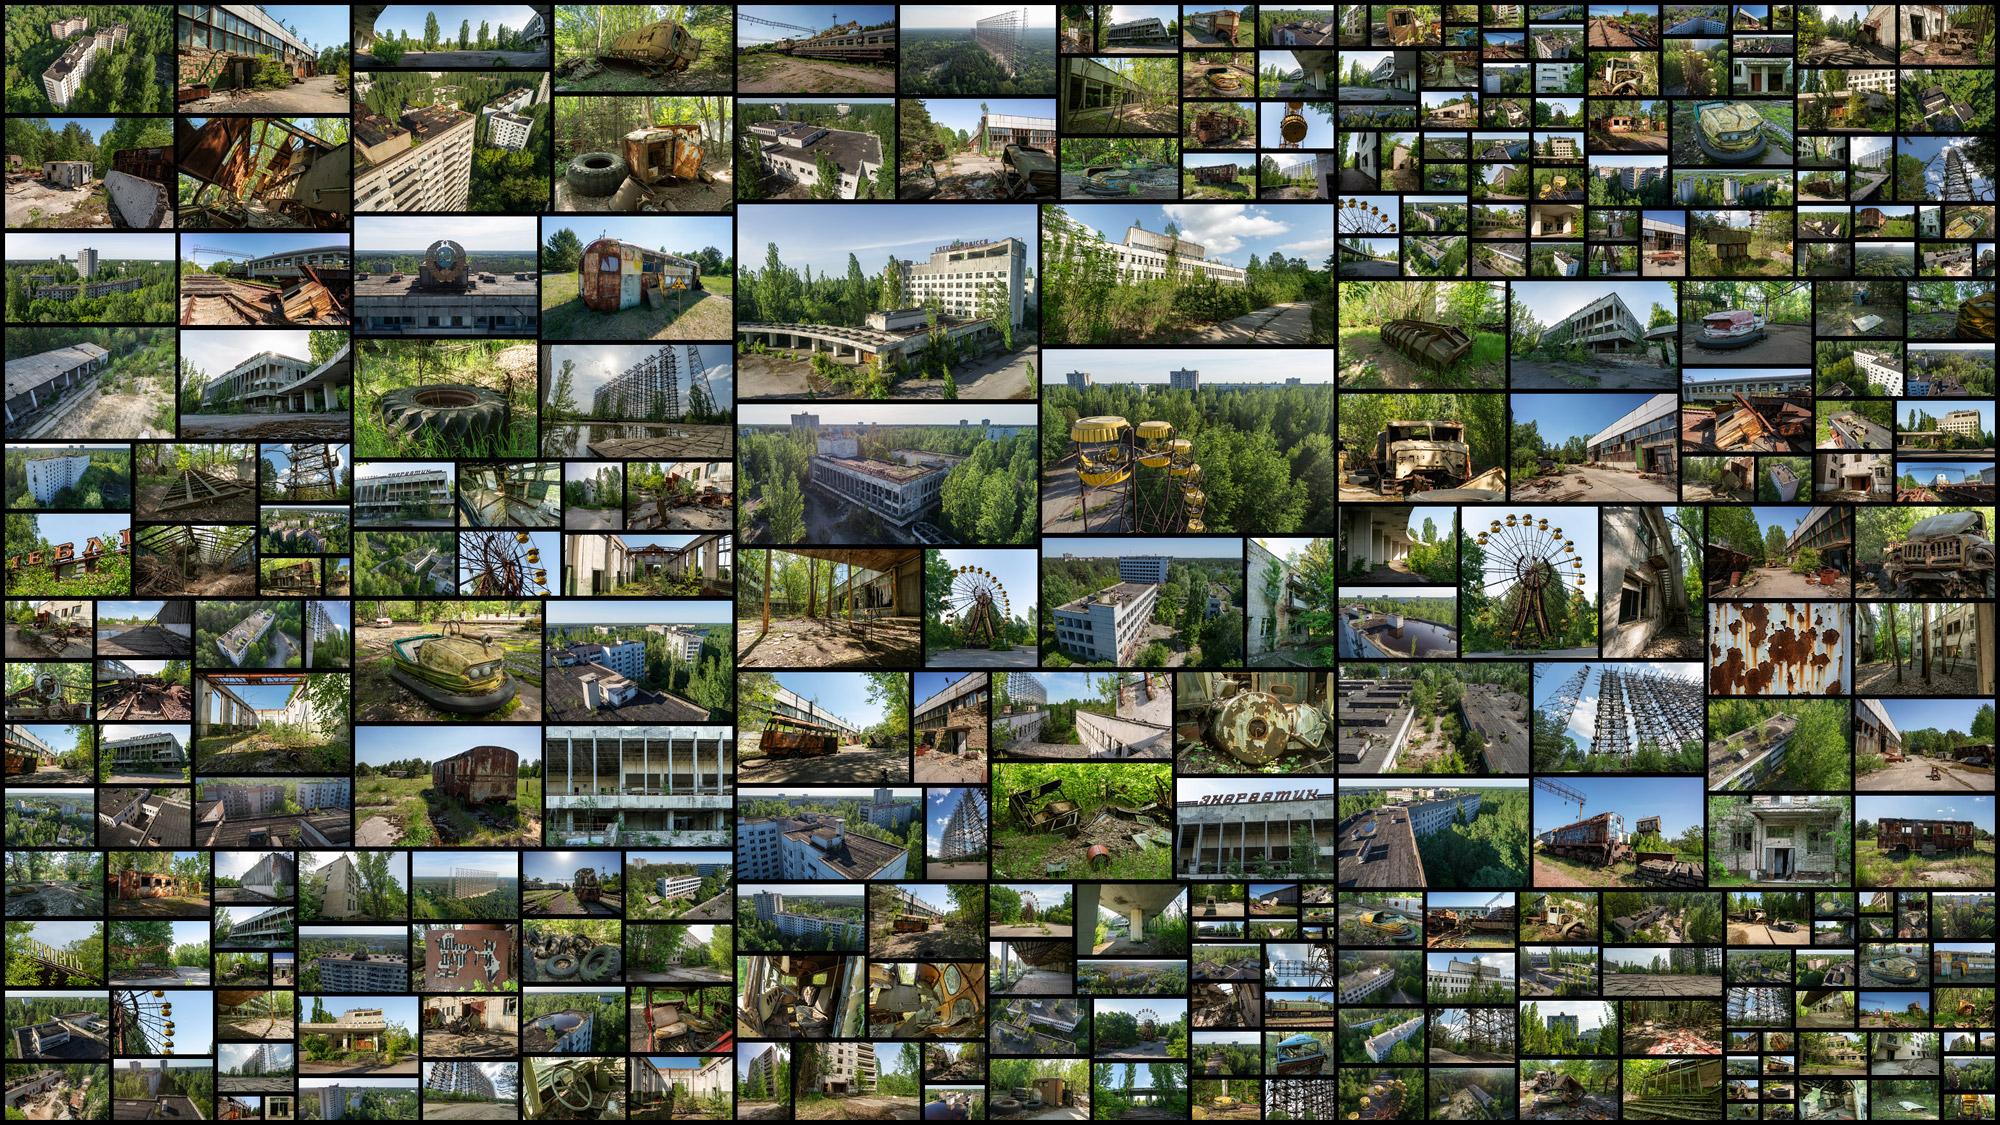 Chernobyl-Exclusion-Zone.jpg